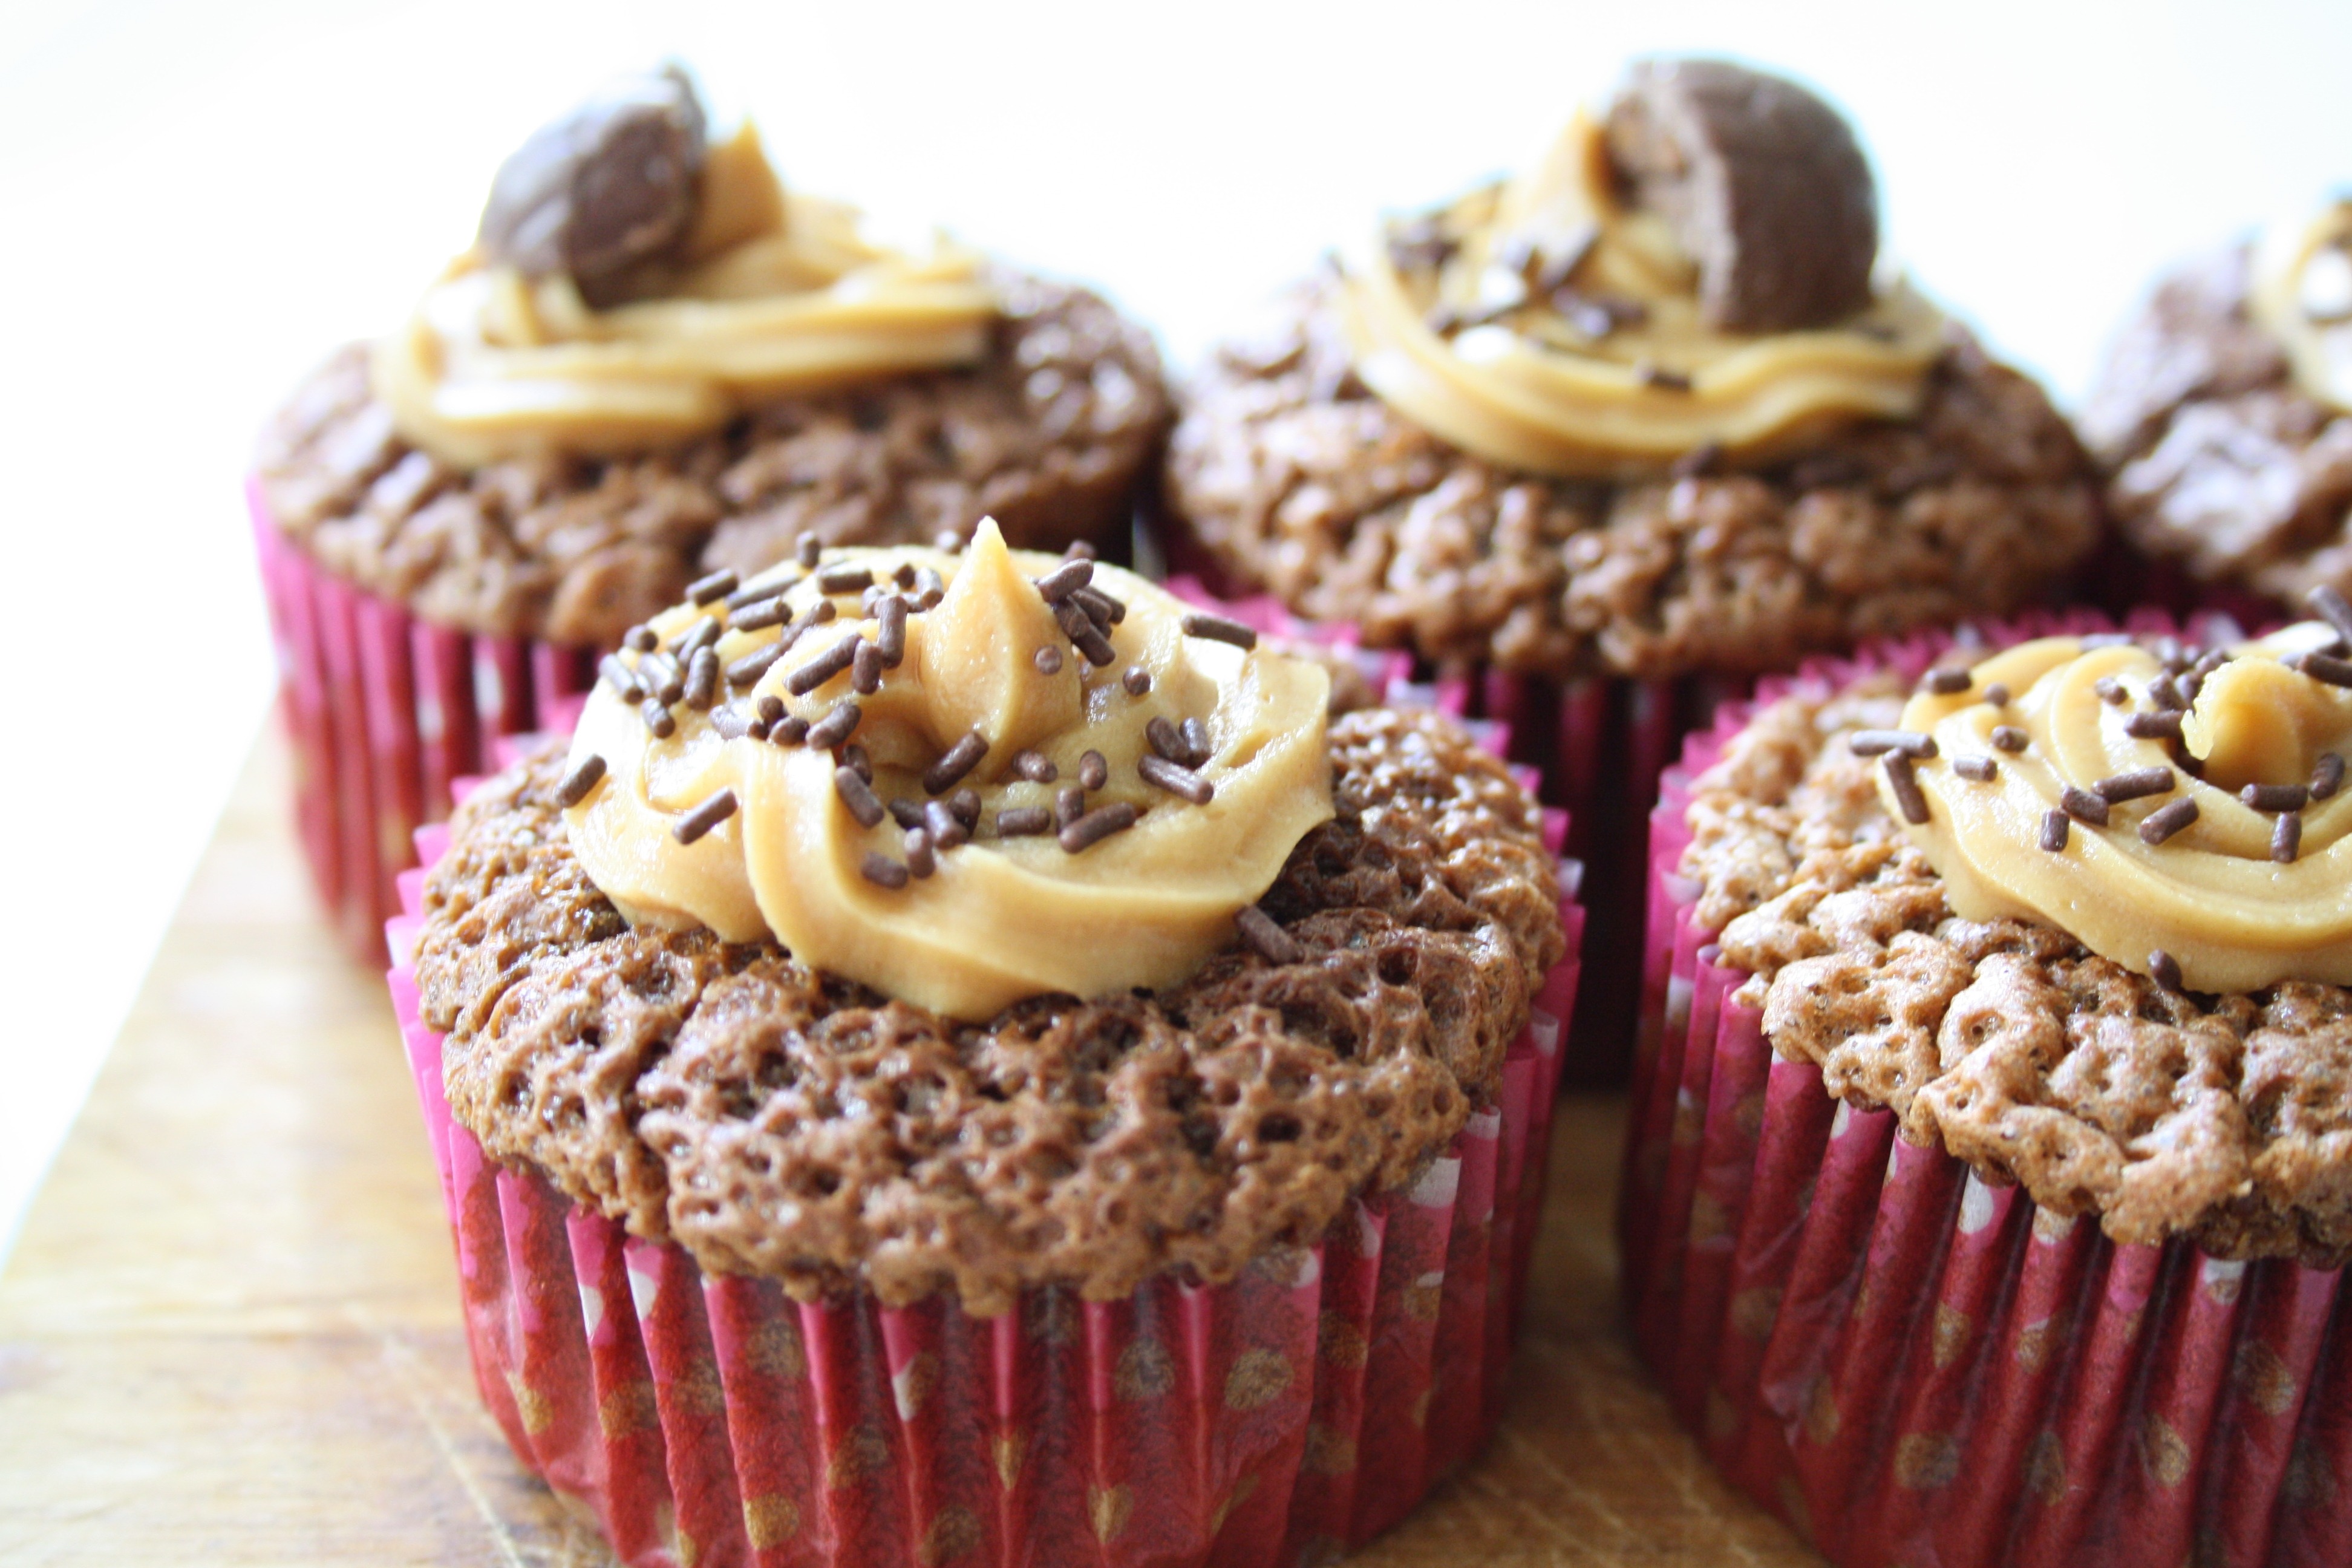 Cupcake Chocolat Cacahuètes - Mathilde et Gourmandises